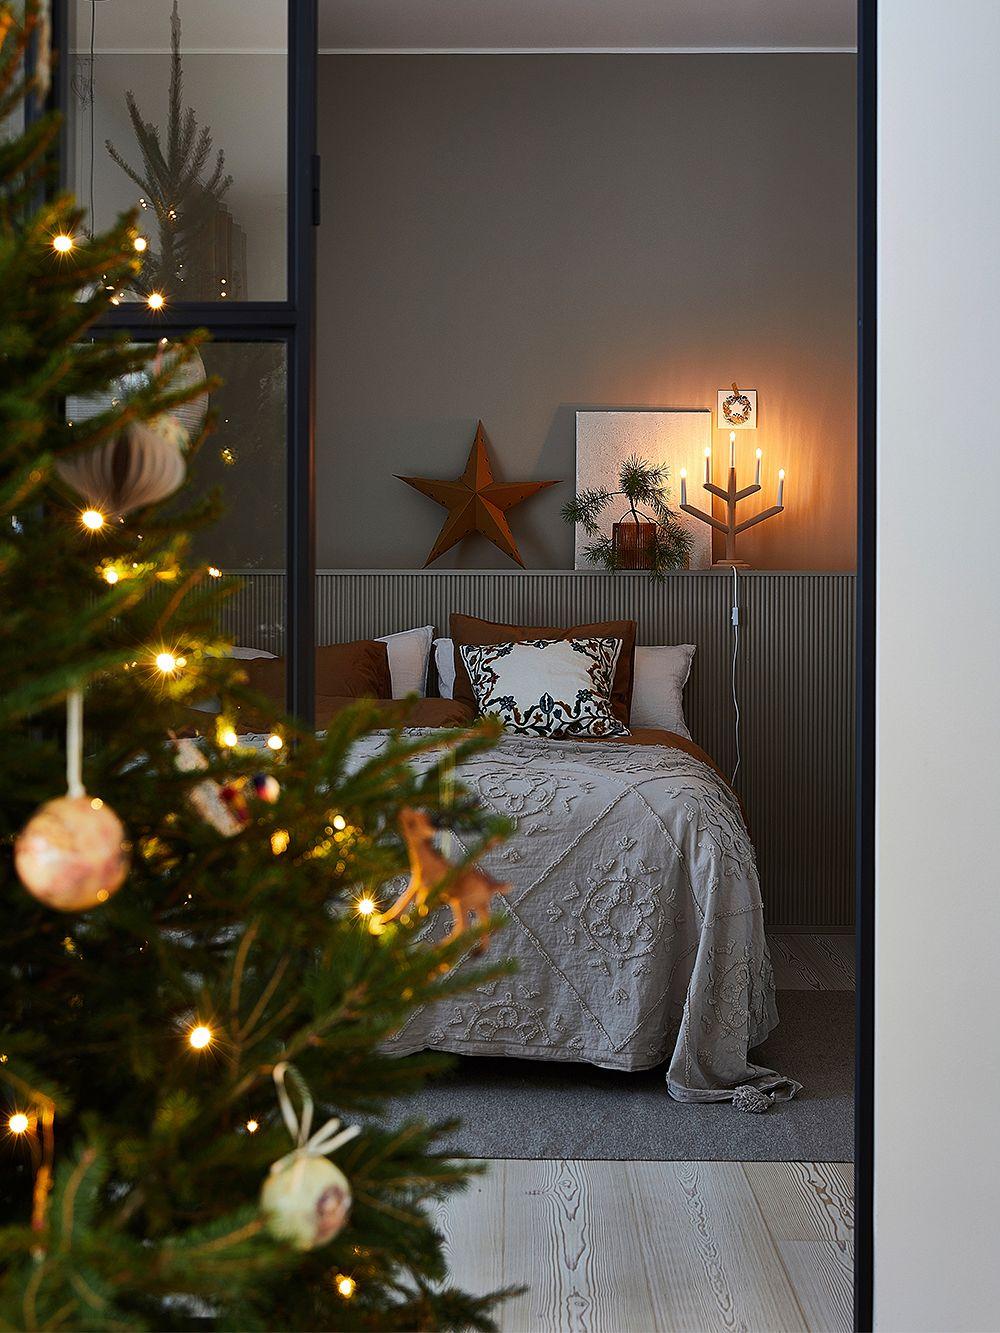 Edla's Christmas home in Oulu